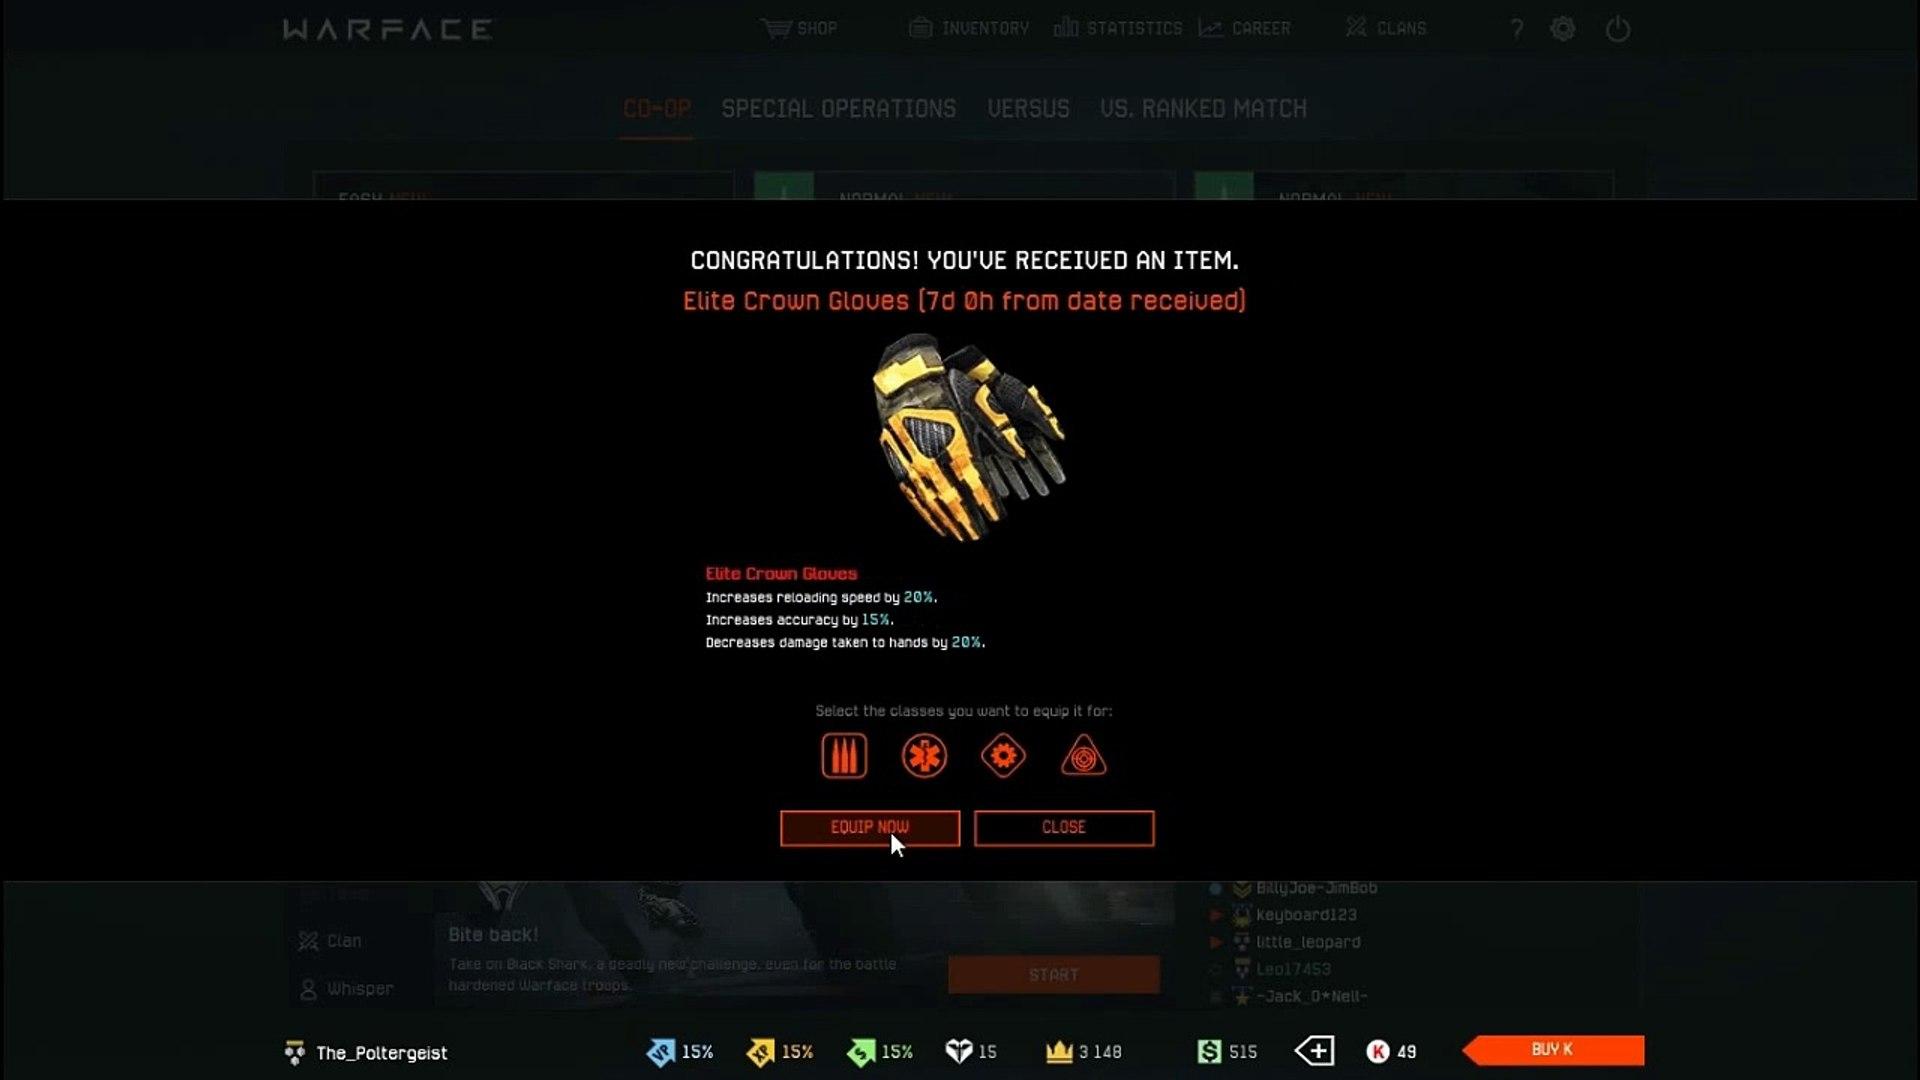 [EXPIRED!] Warface redeem code 30,000 xp crown gear December 2016